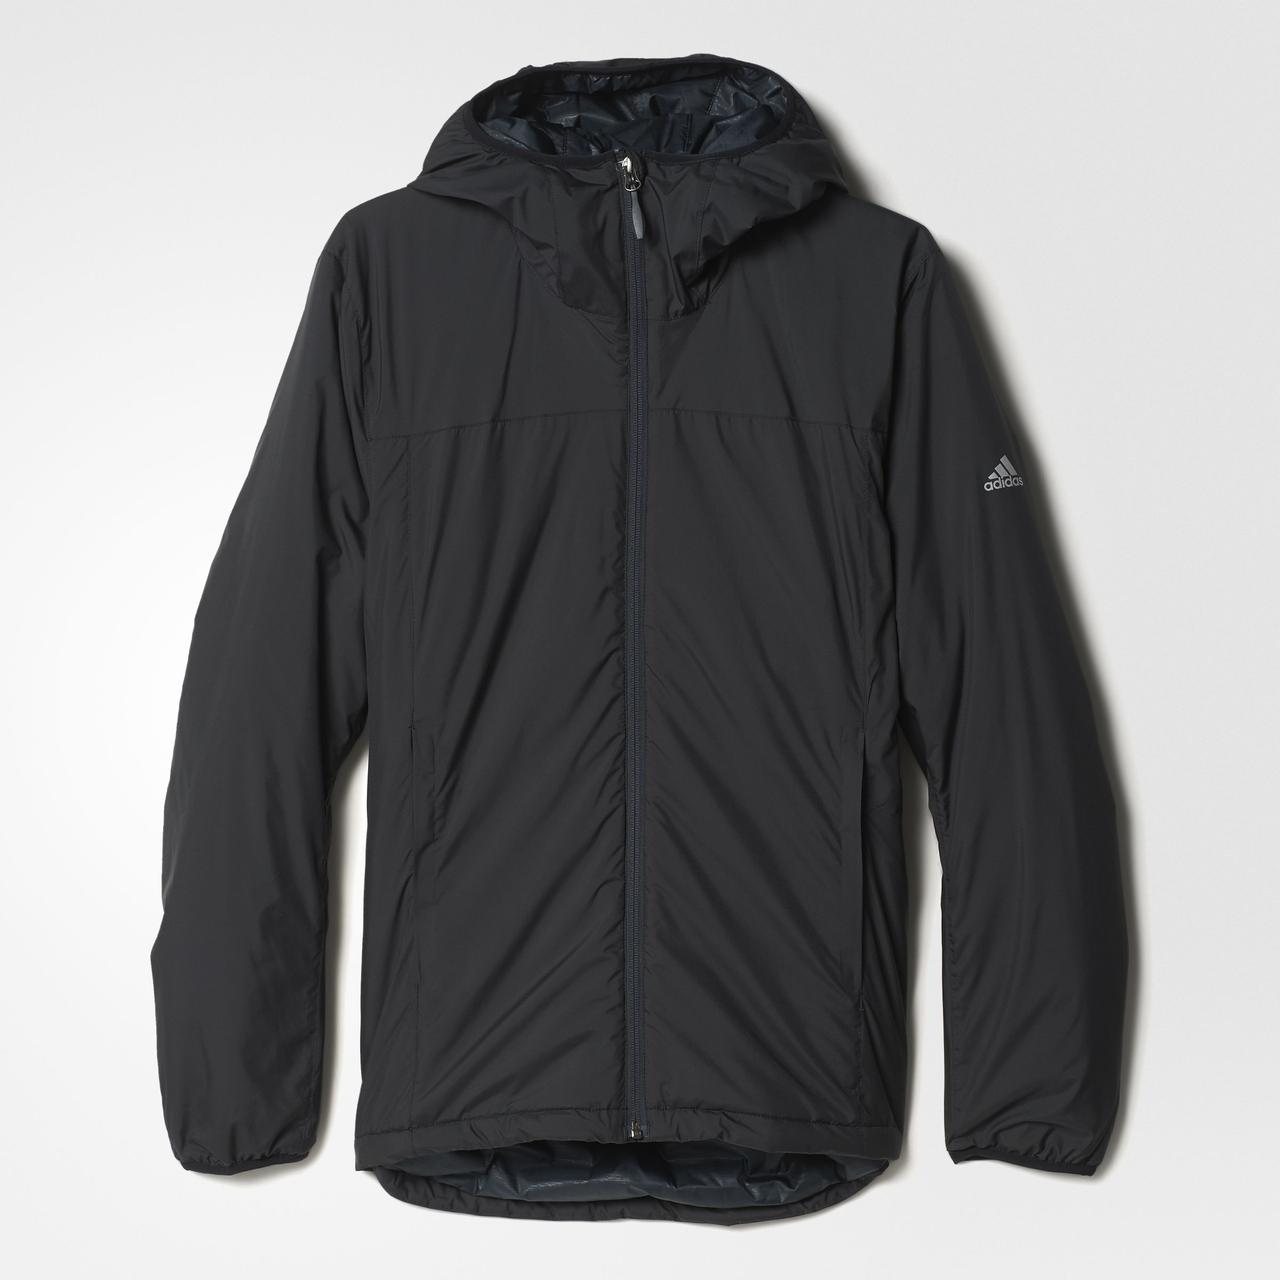 2c02fdcc Мужская зимняя куртка adidas Alploft M AA1937: продажа, цена в ...